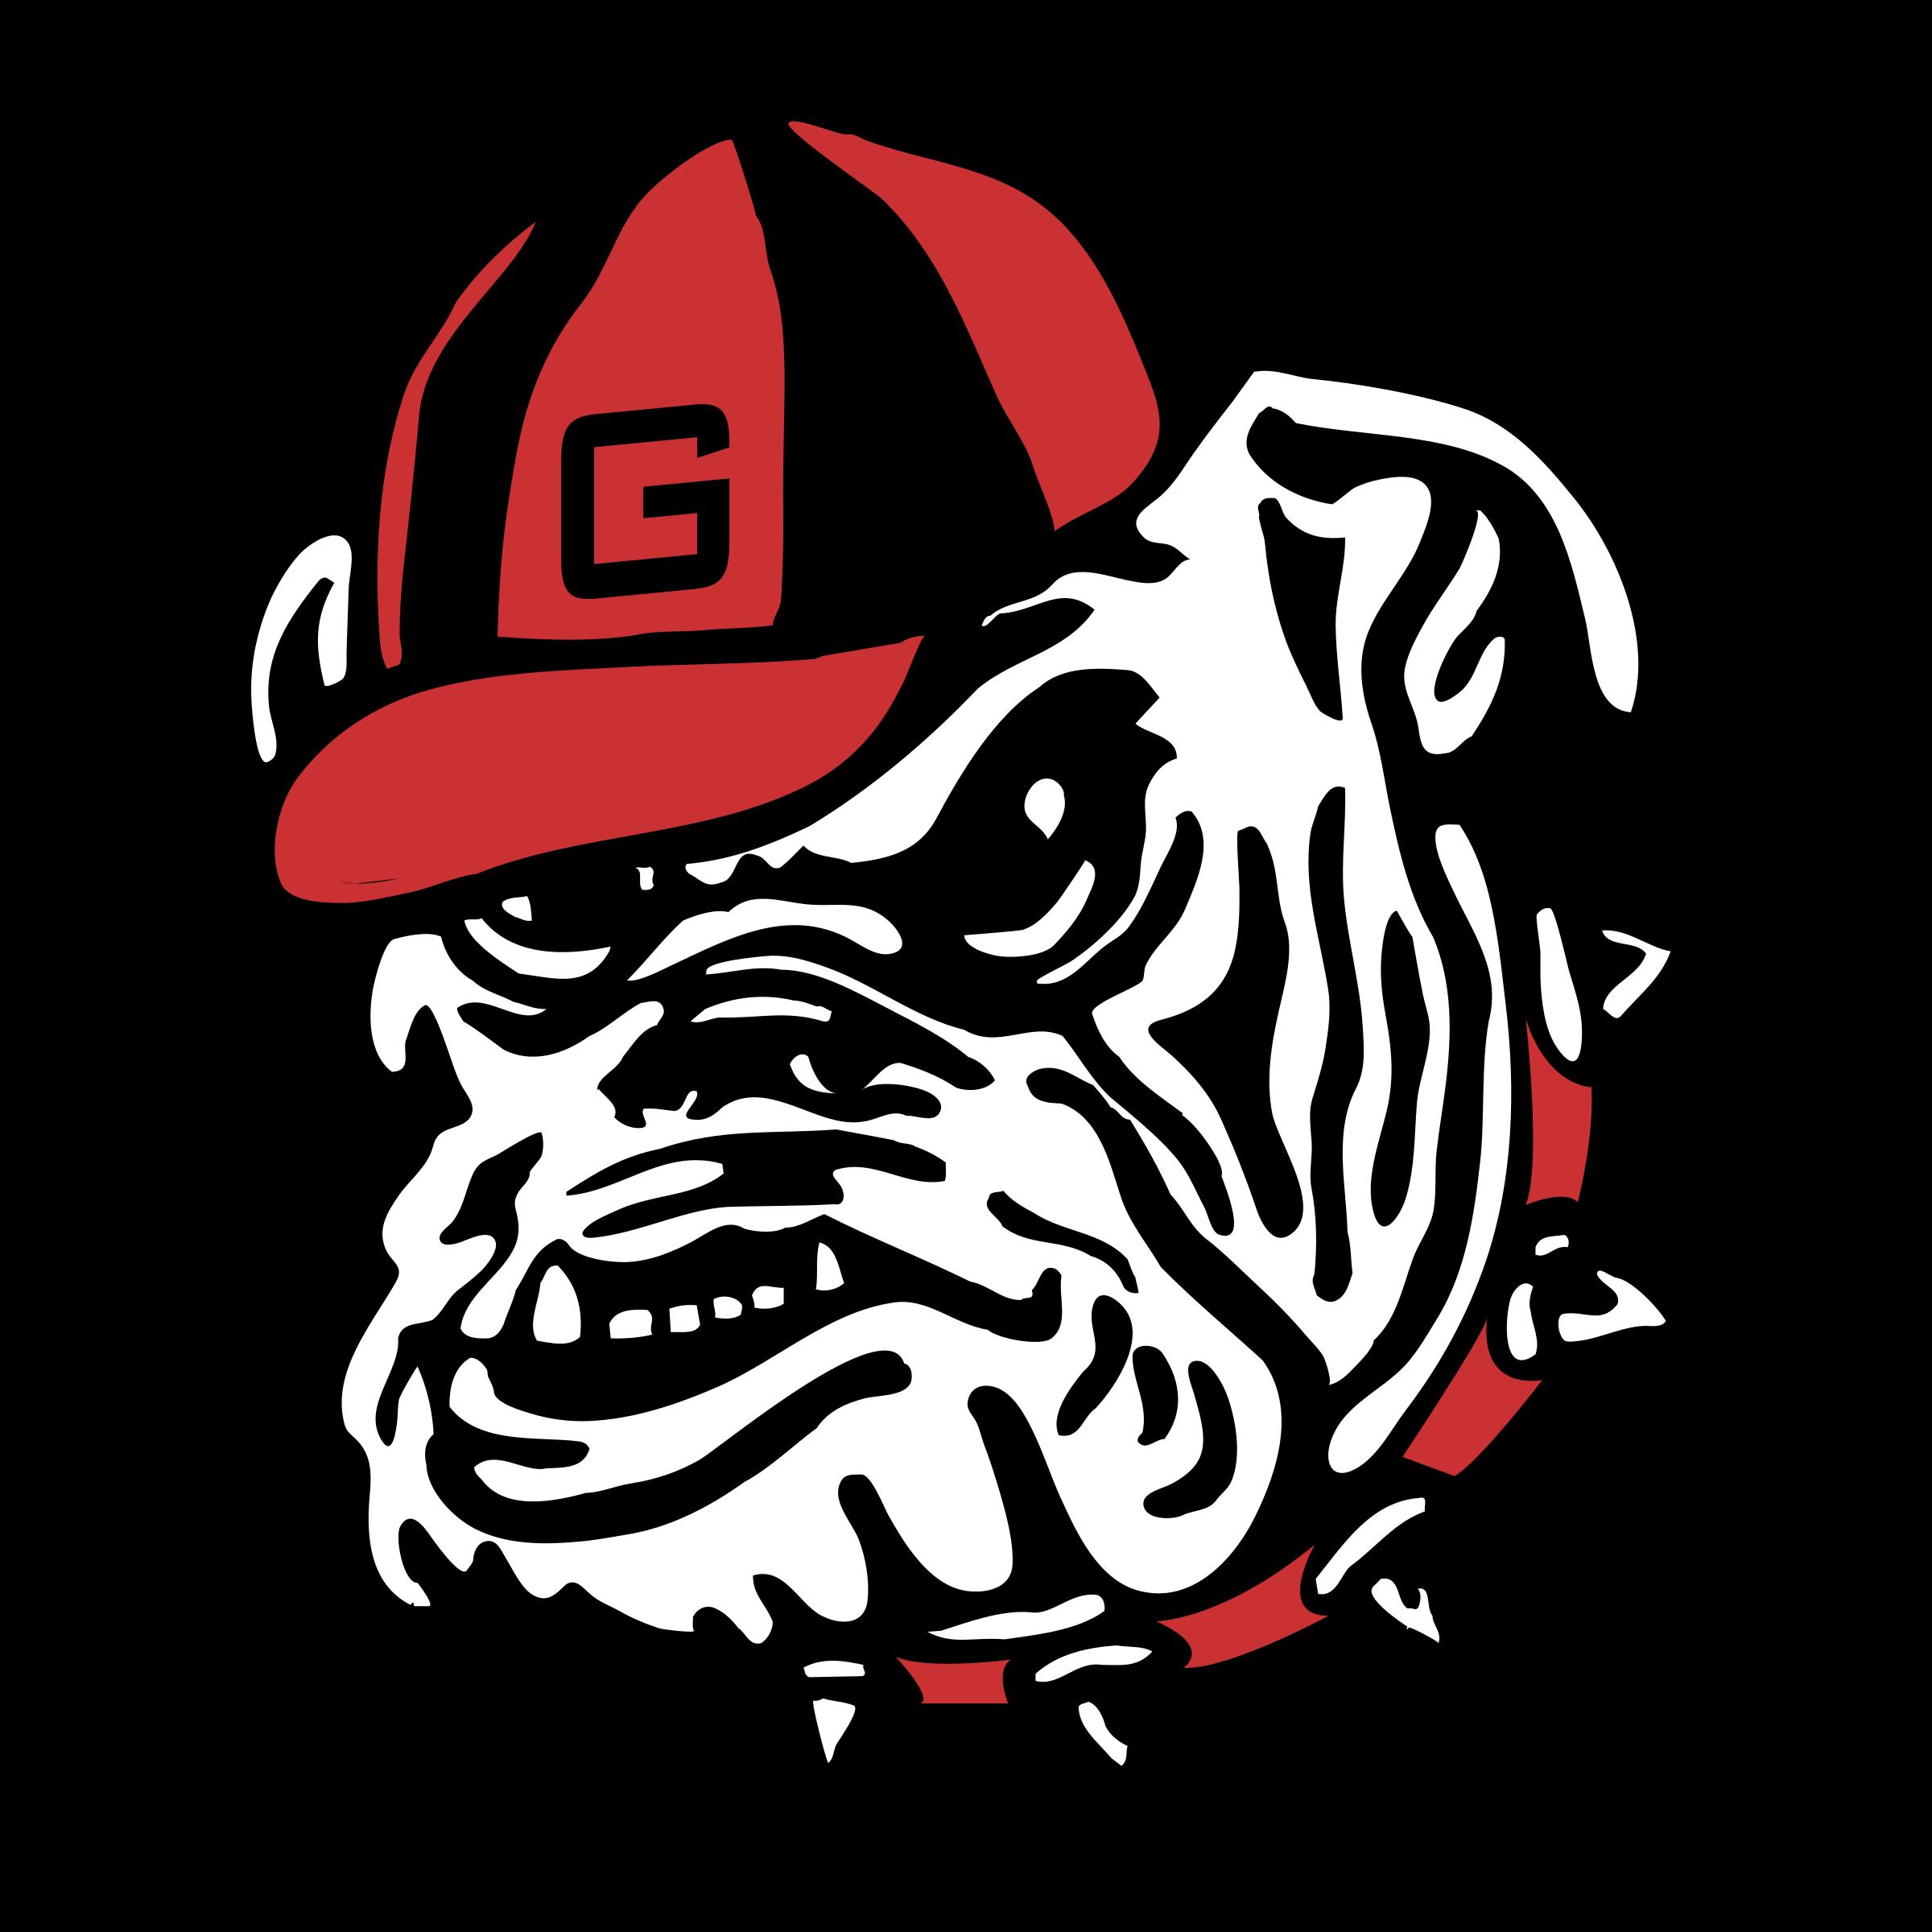 Georgia bulldogs at getdrawings. Patient clipart svg